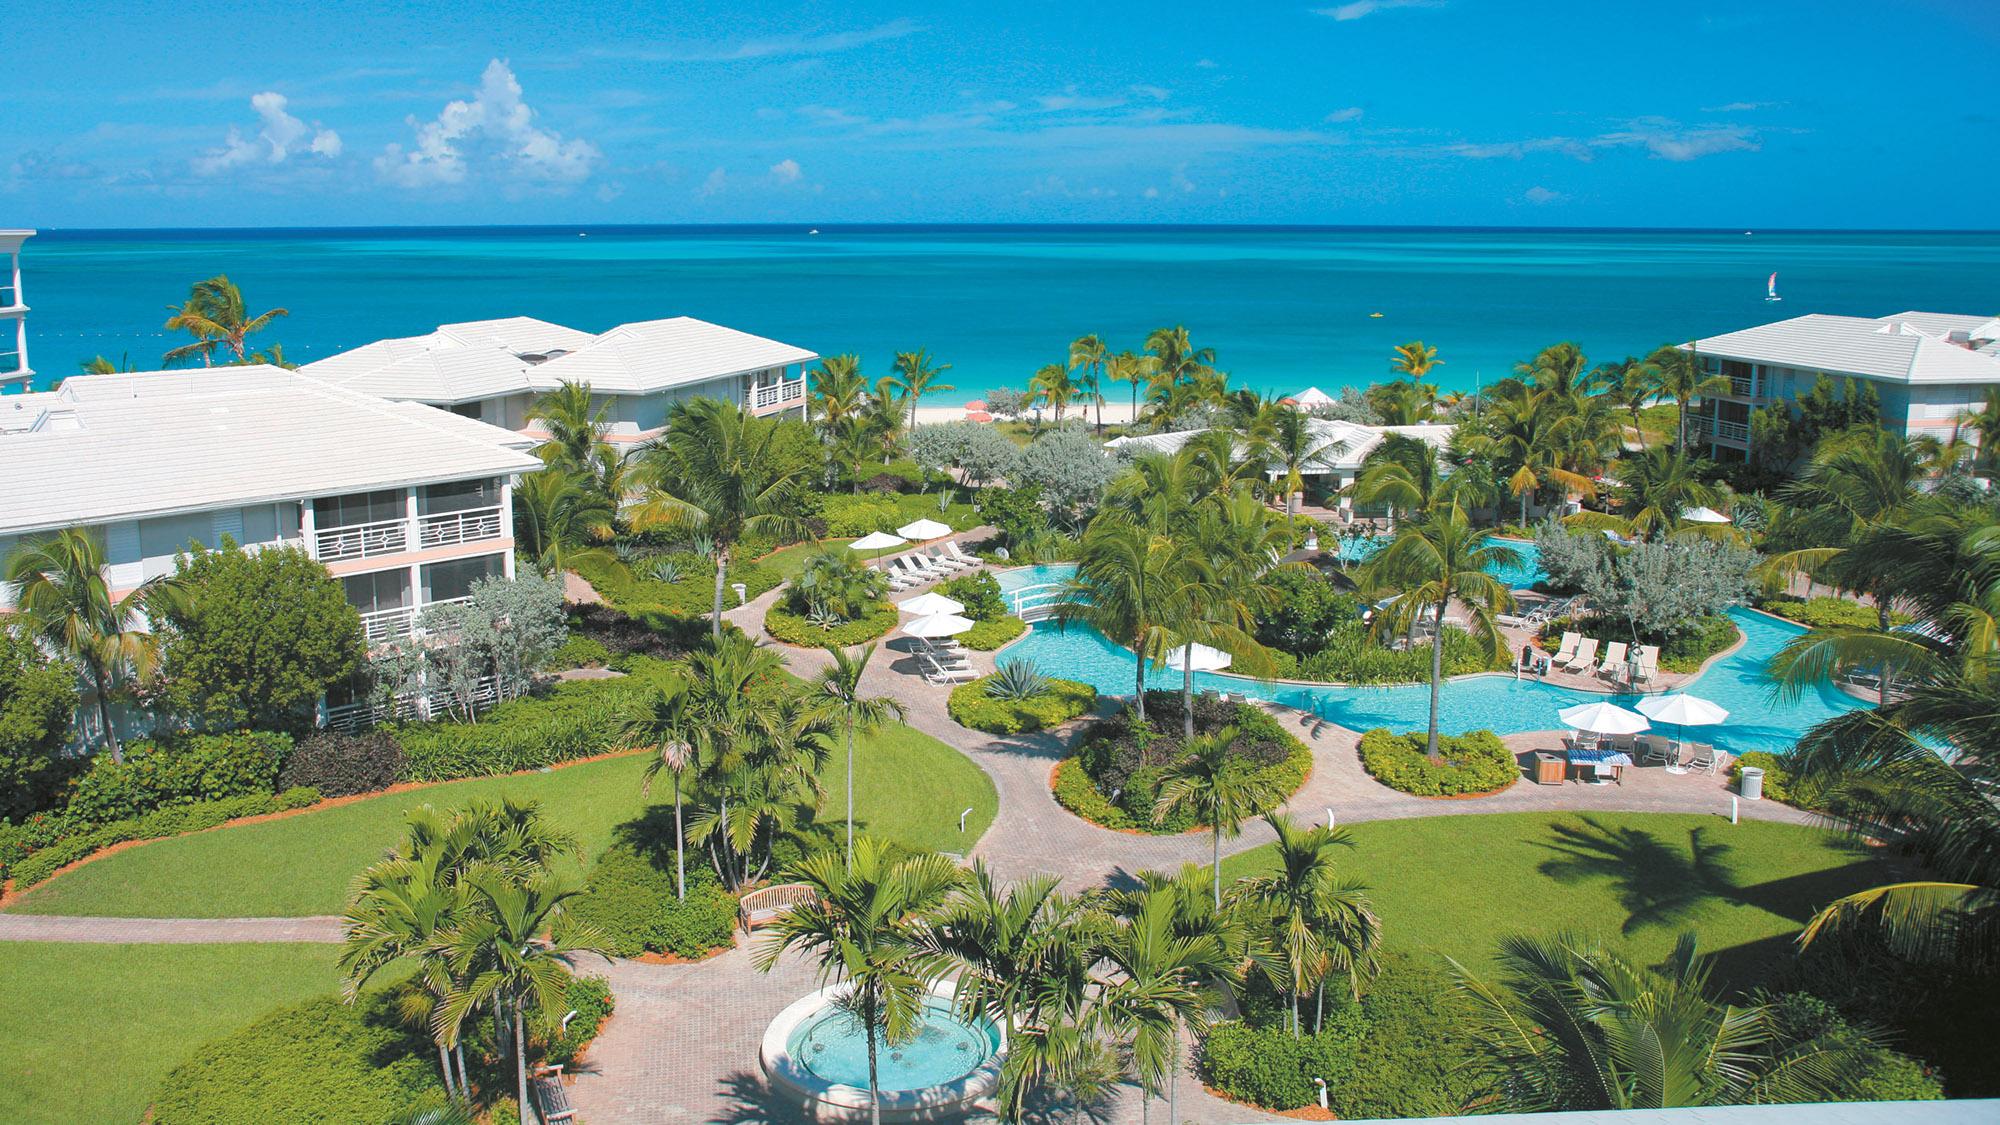 Ocean Club West Turks and Caicos